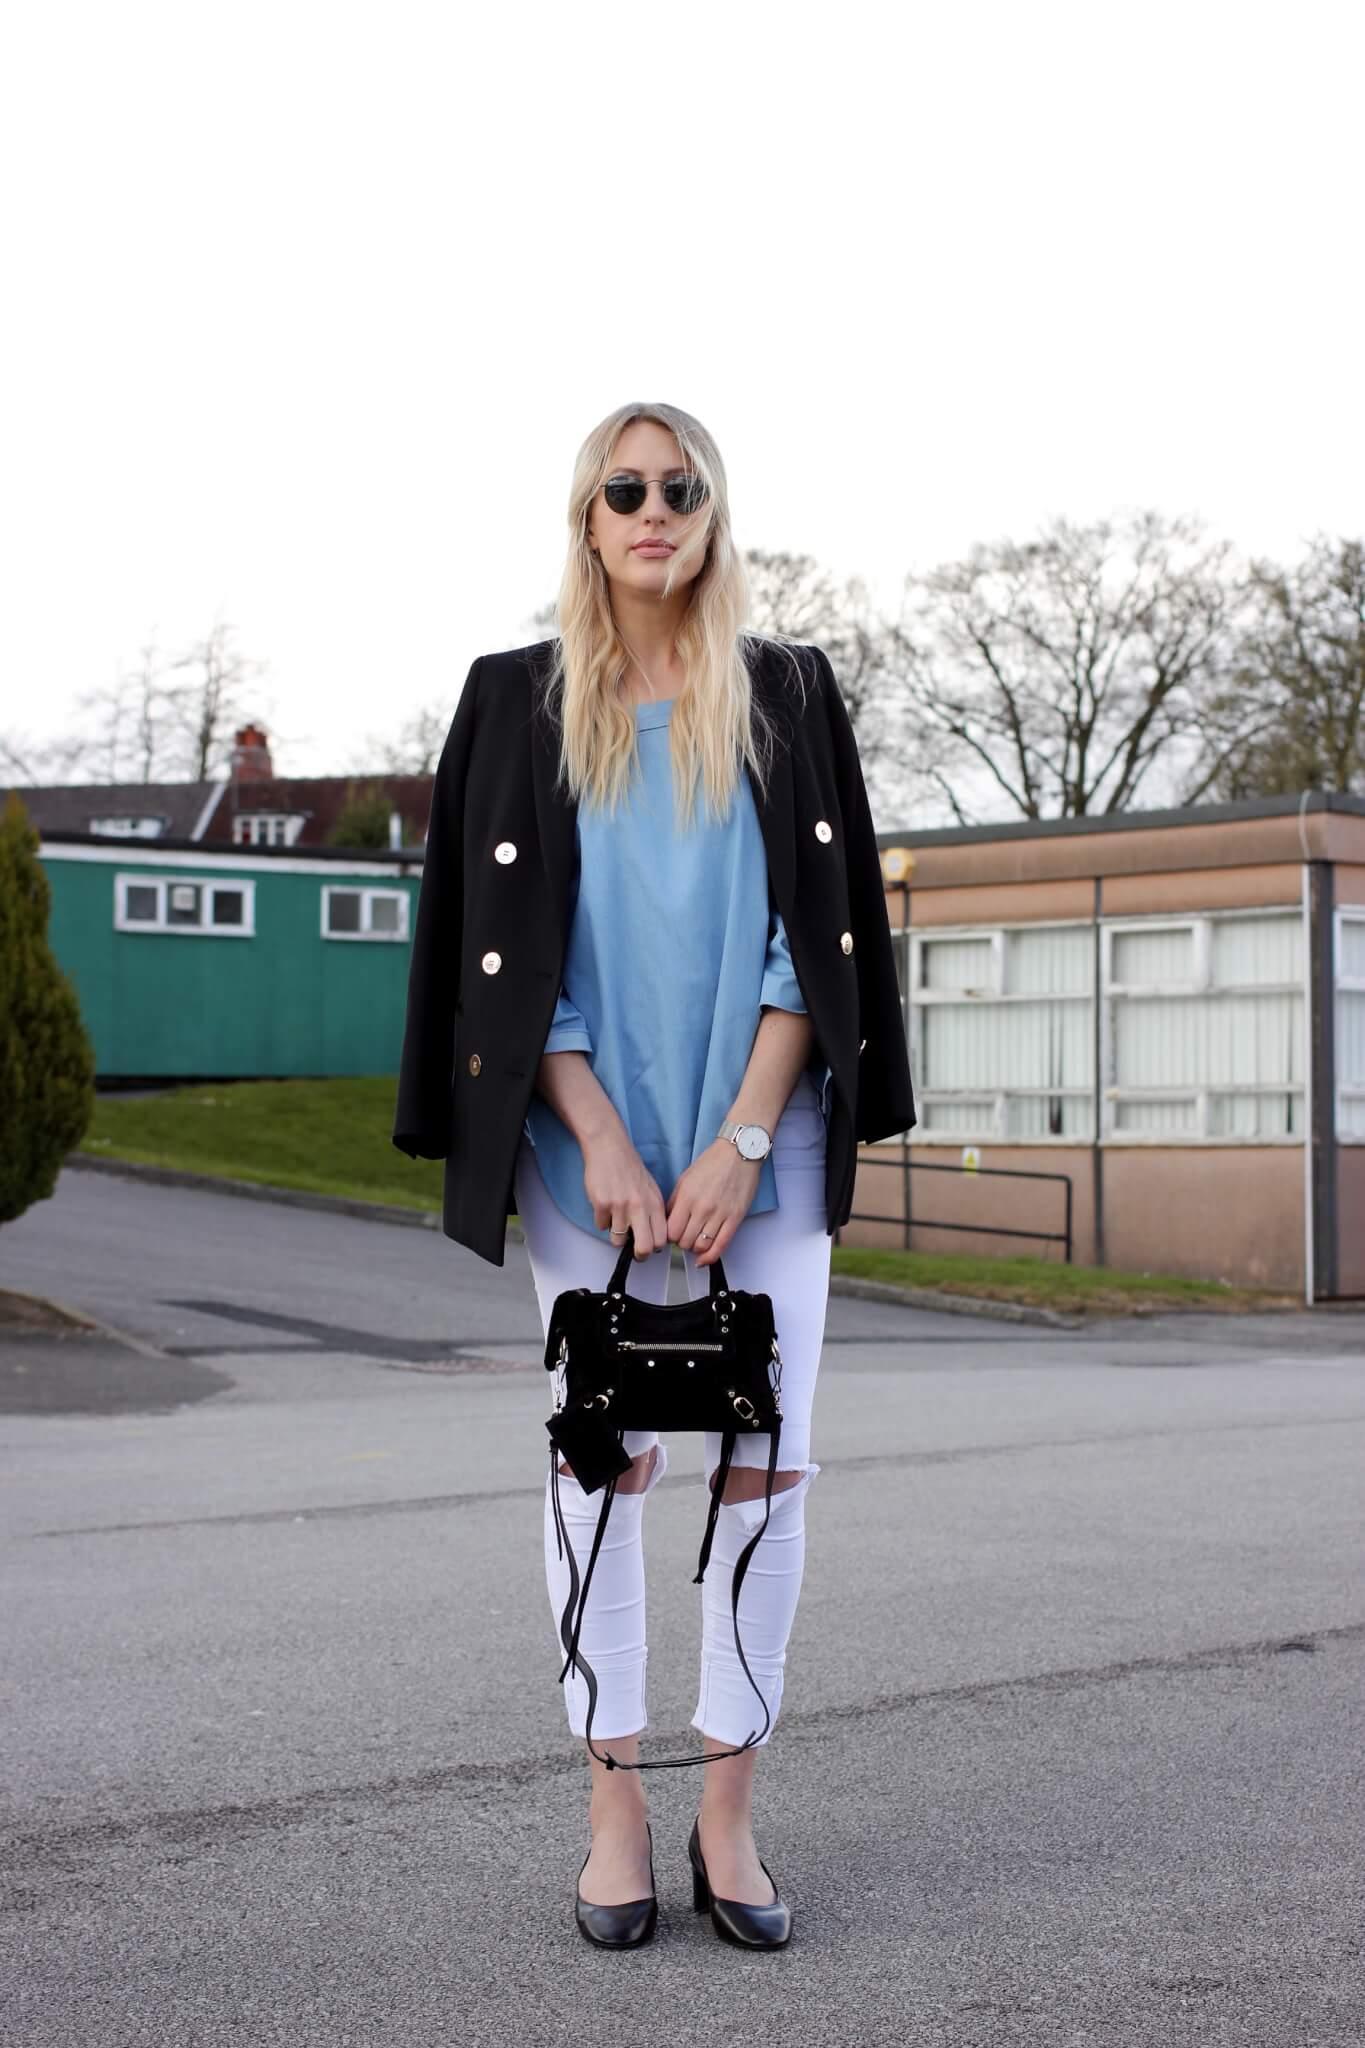 spring-blazer-outfit-with-white-jeans-on-fashion-blog-lurchhoundloves_26393960122_o